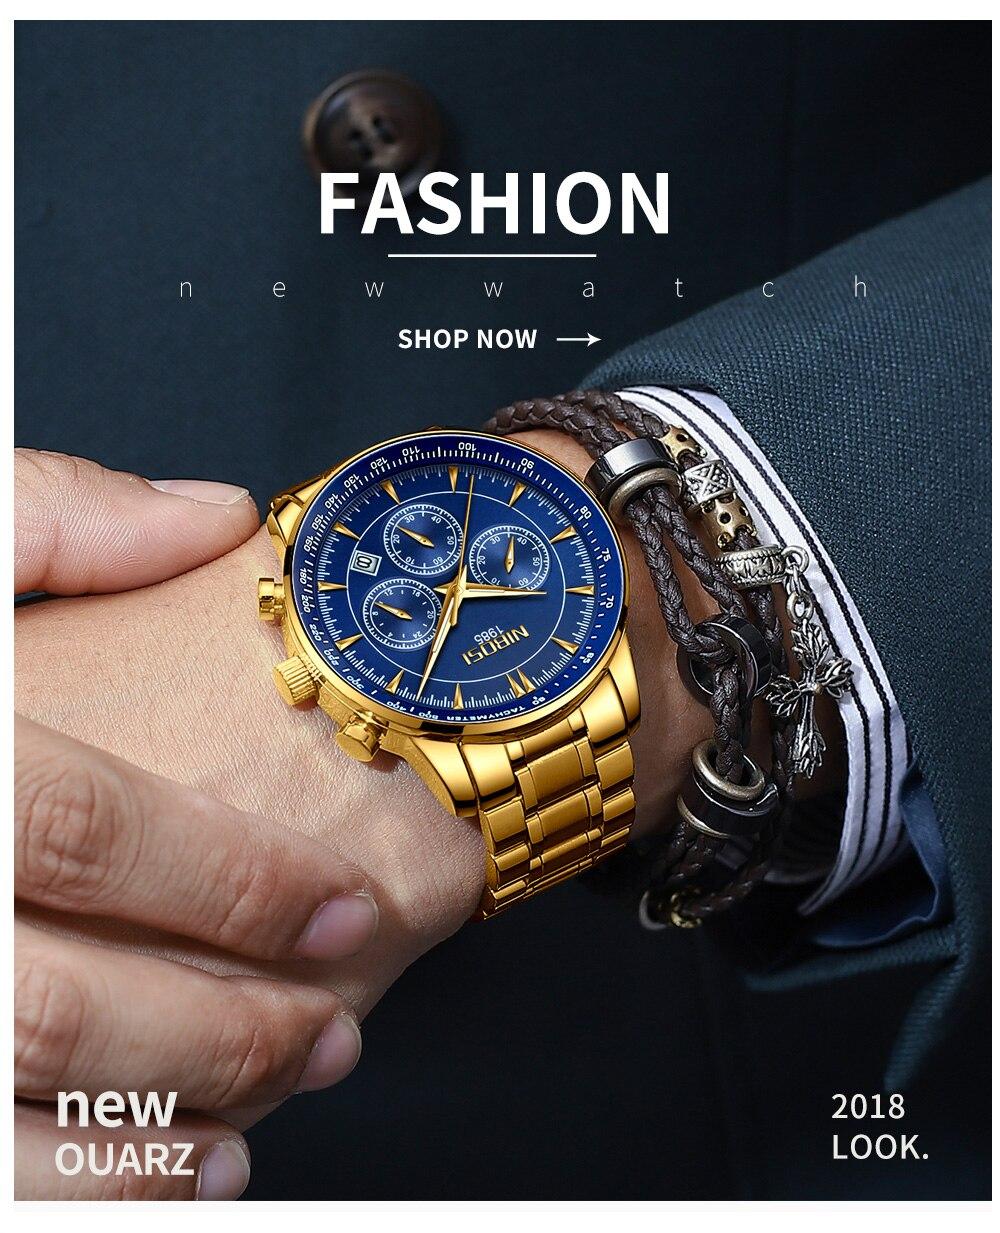 Relogio Masculino NIBOSI Quartz Watches Men Steel Band Men Watches 2018 Luxury Brand Waterproof Wrist Watches For Men Brand Saat (9)